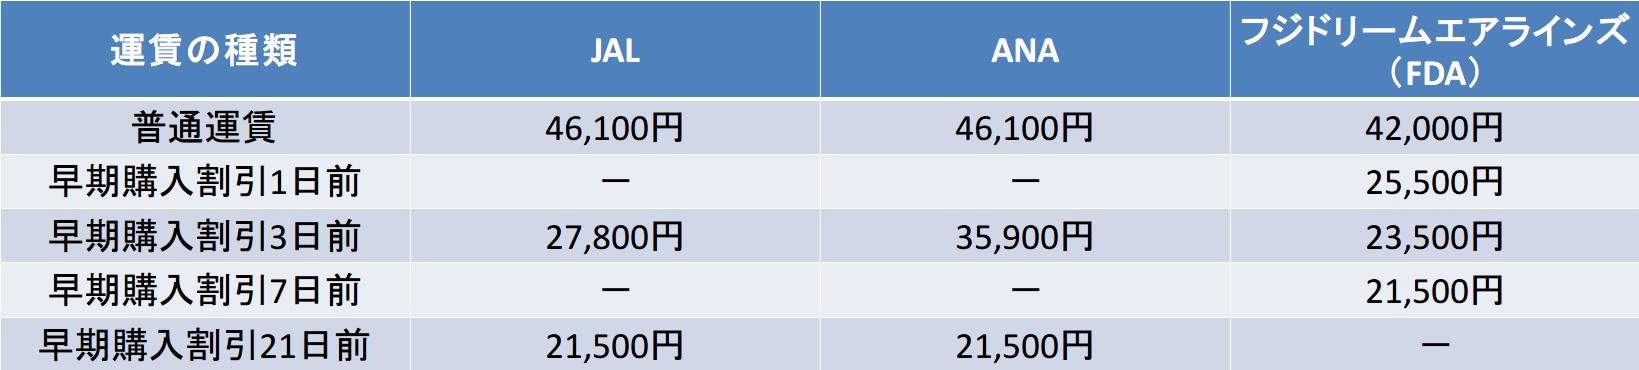 JALANAフジドリームエアラインズの料金比較表